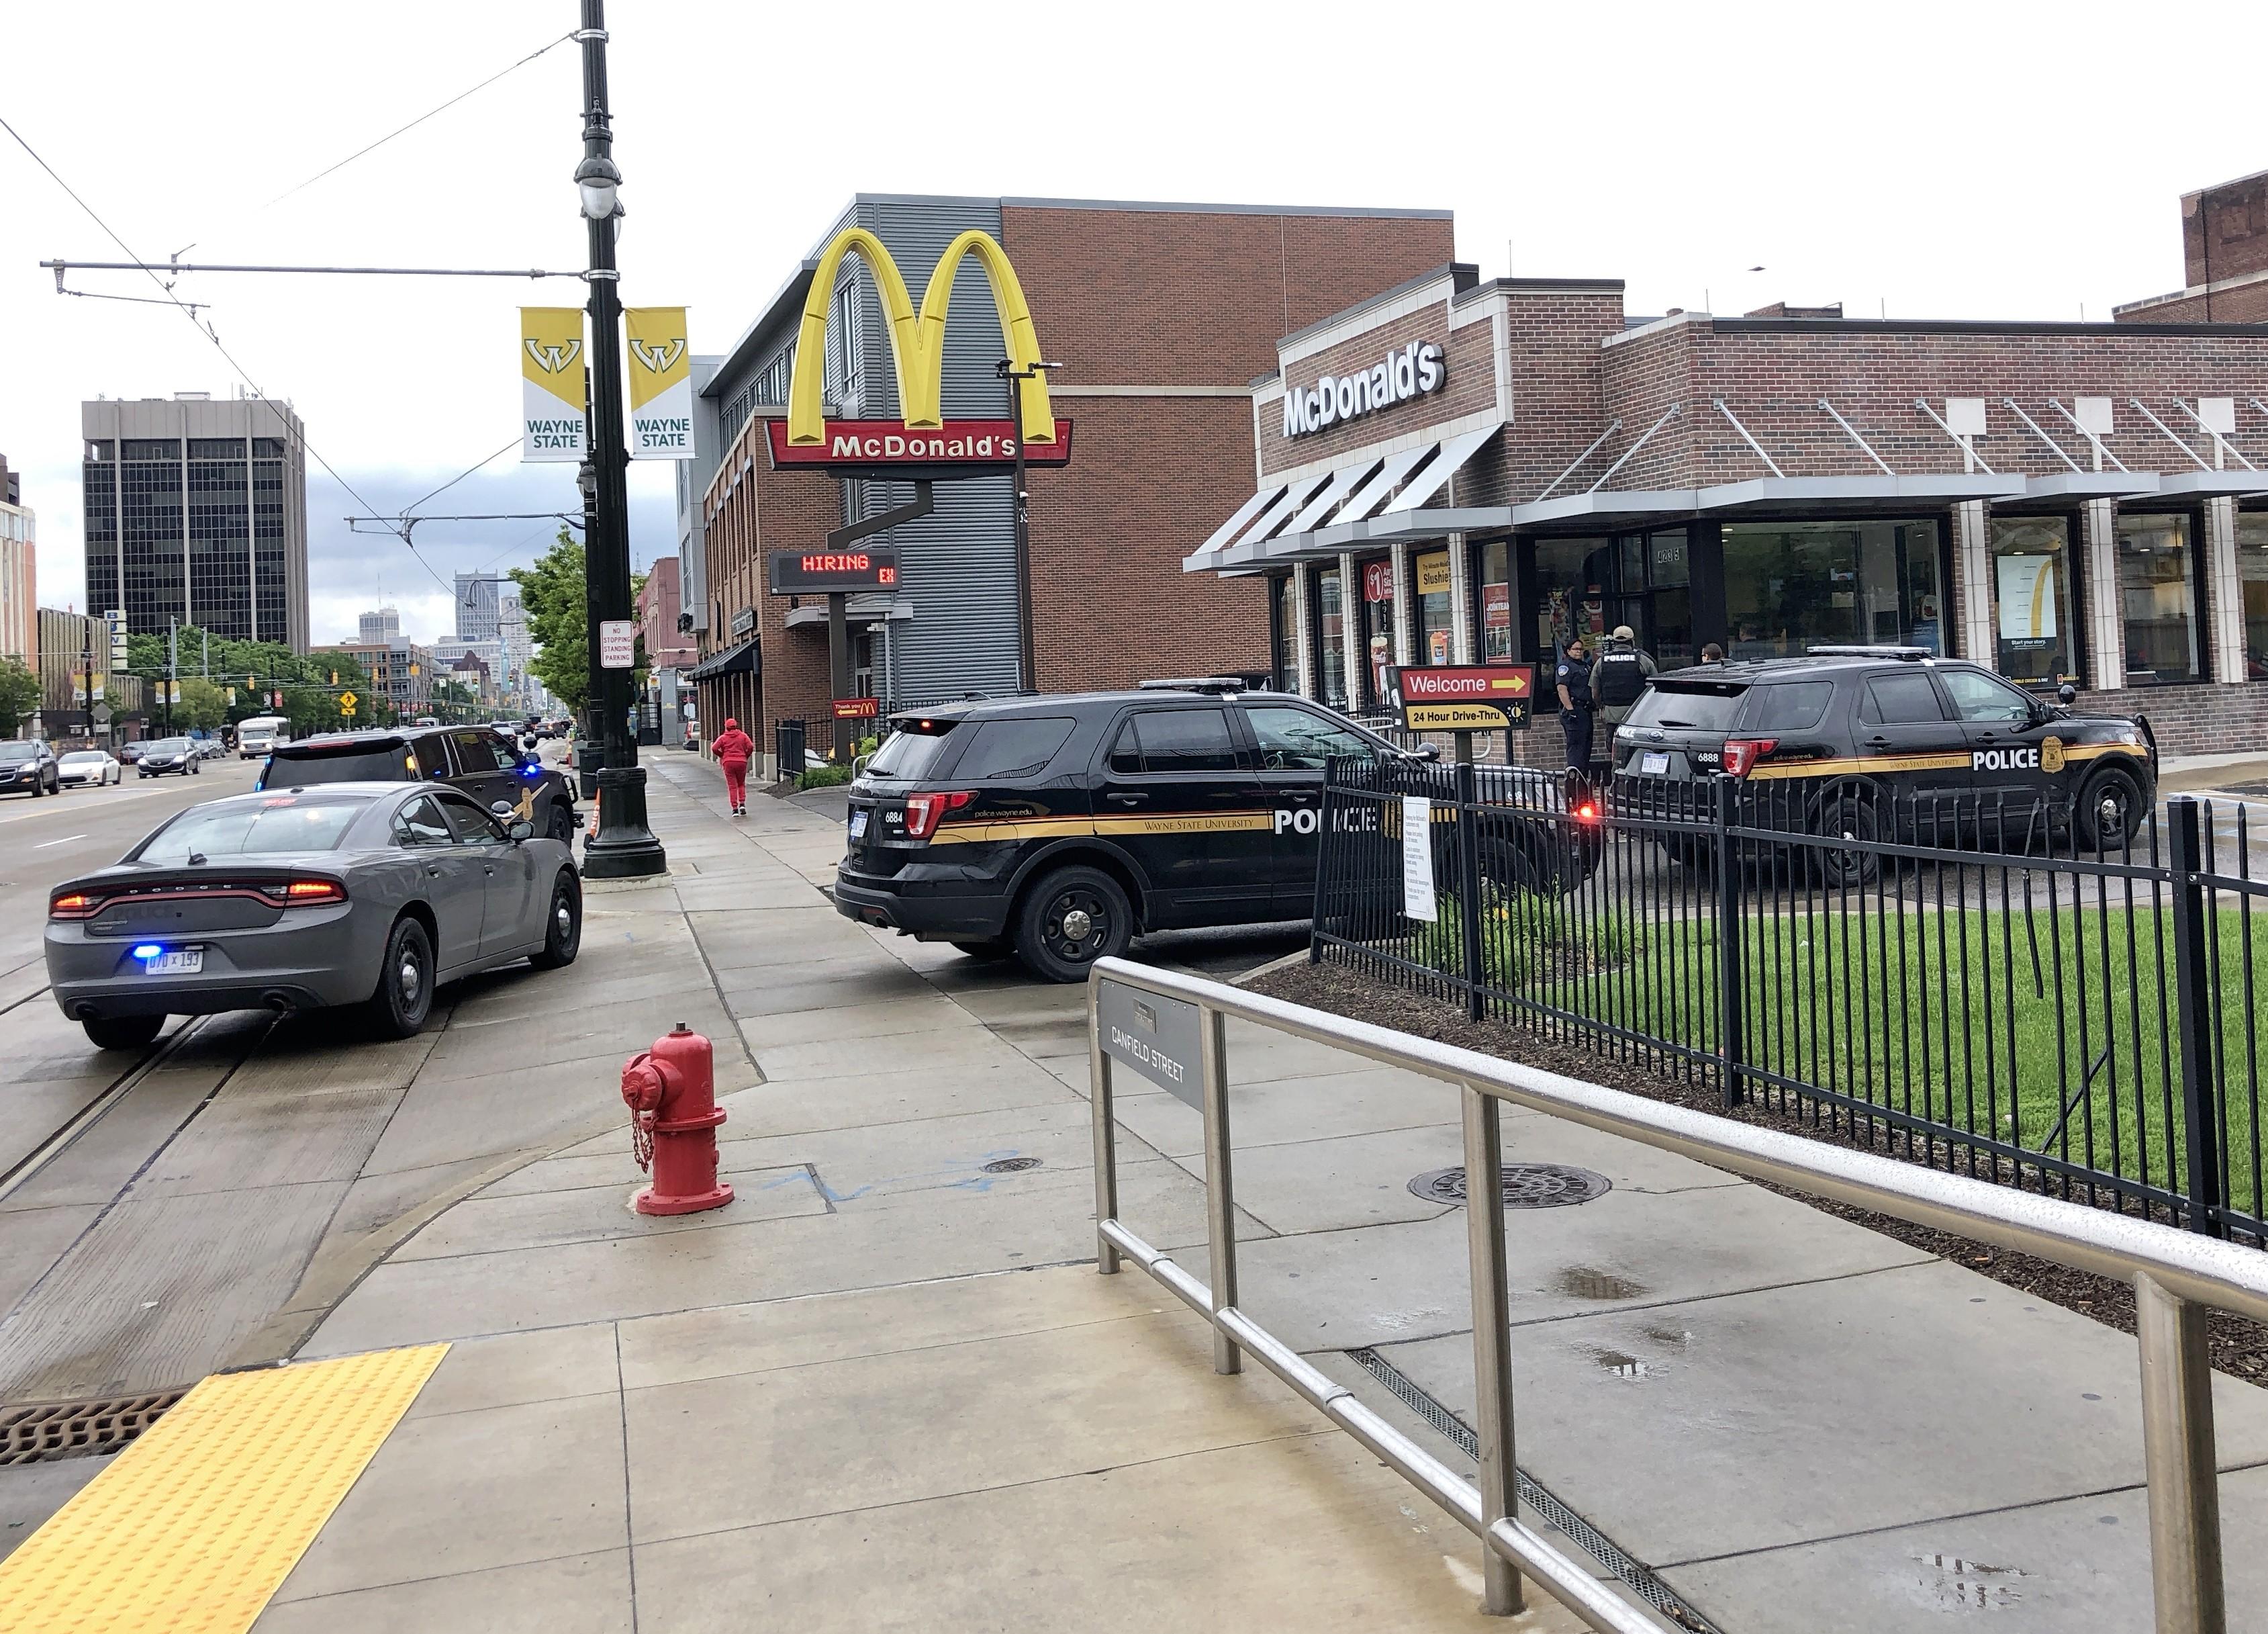 detroit mcdonalds customers say - HD3378×2433